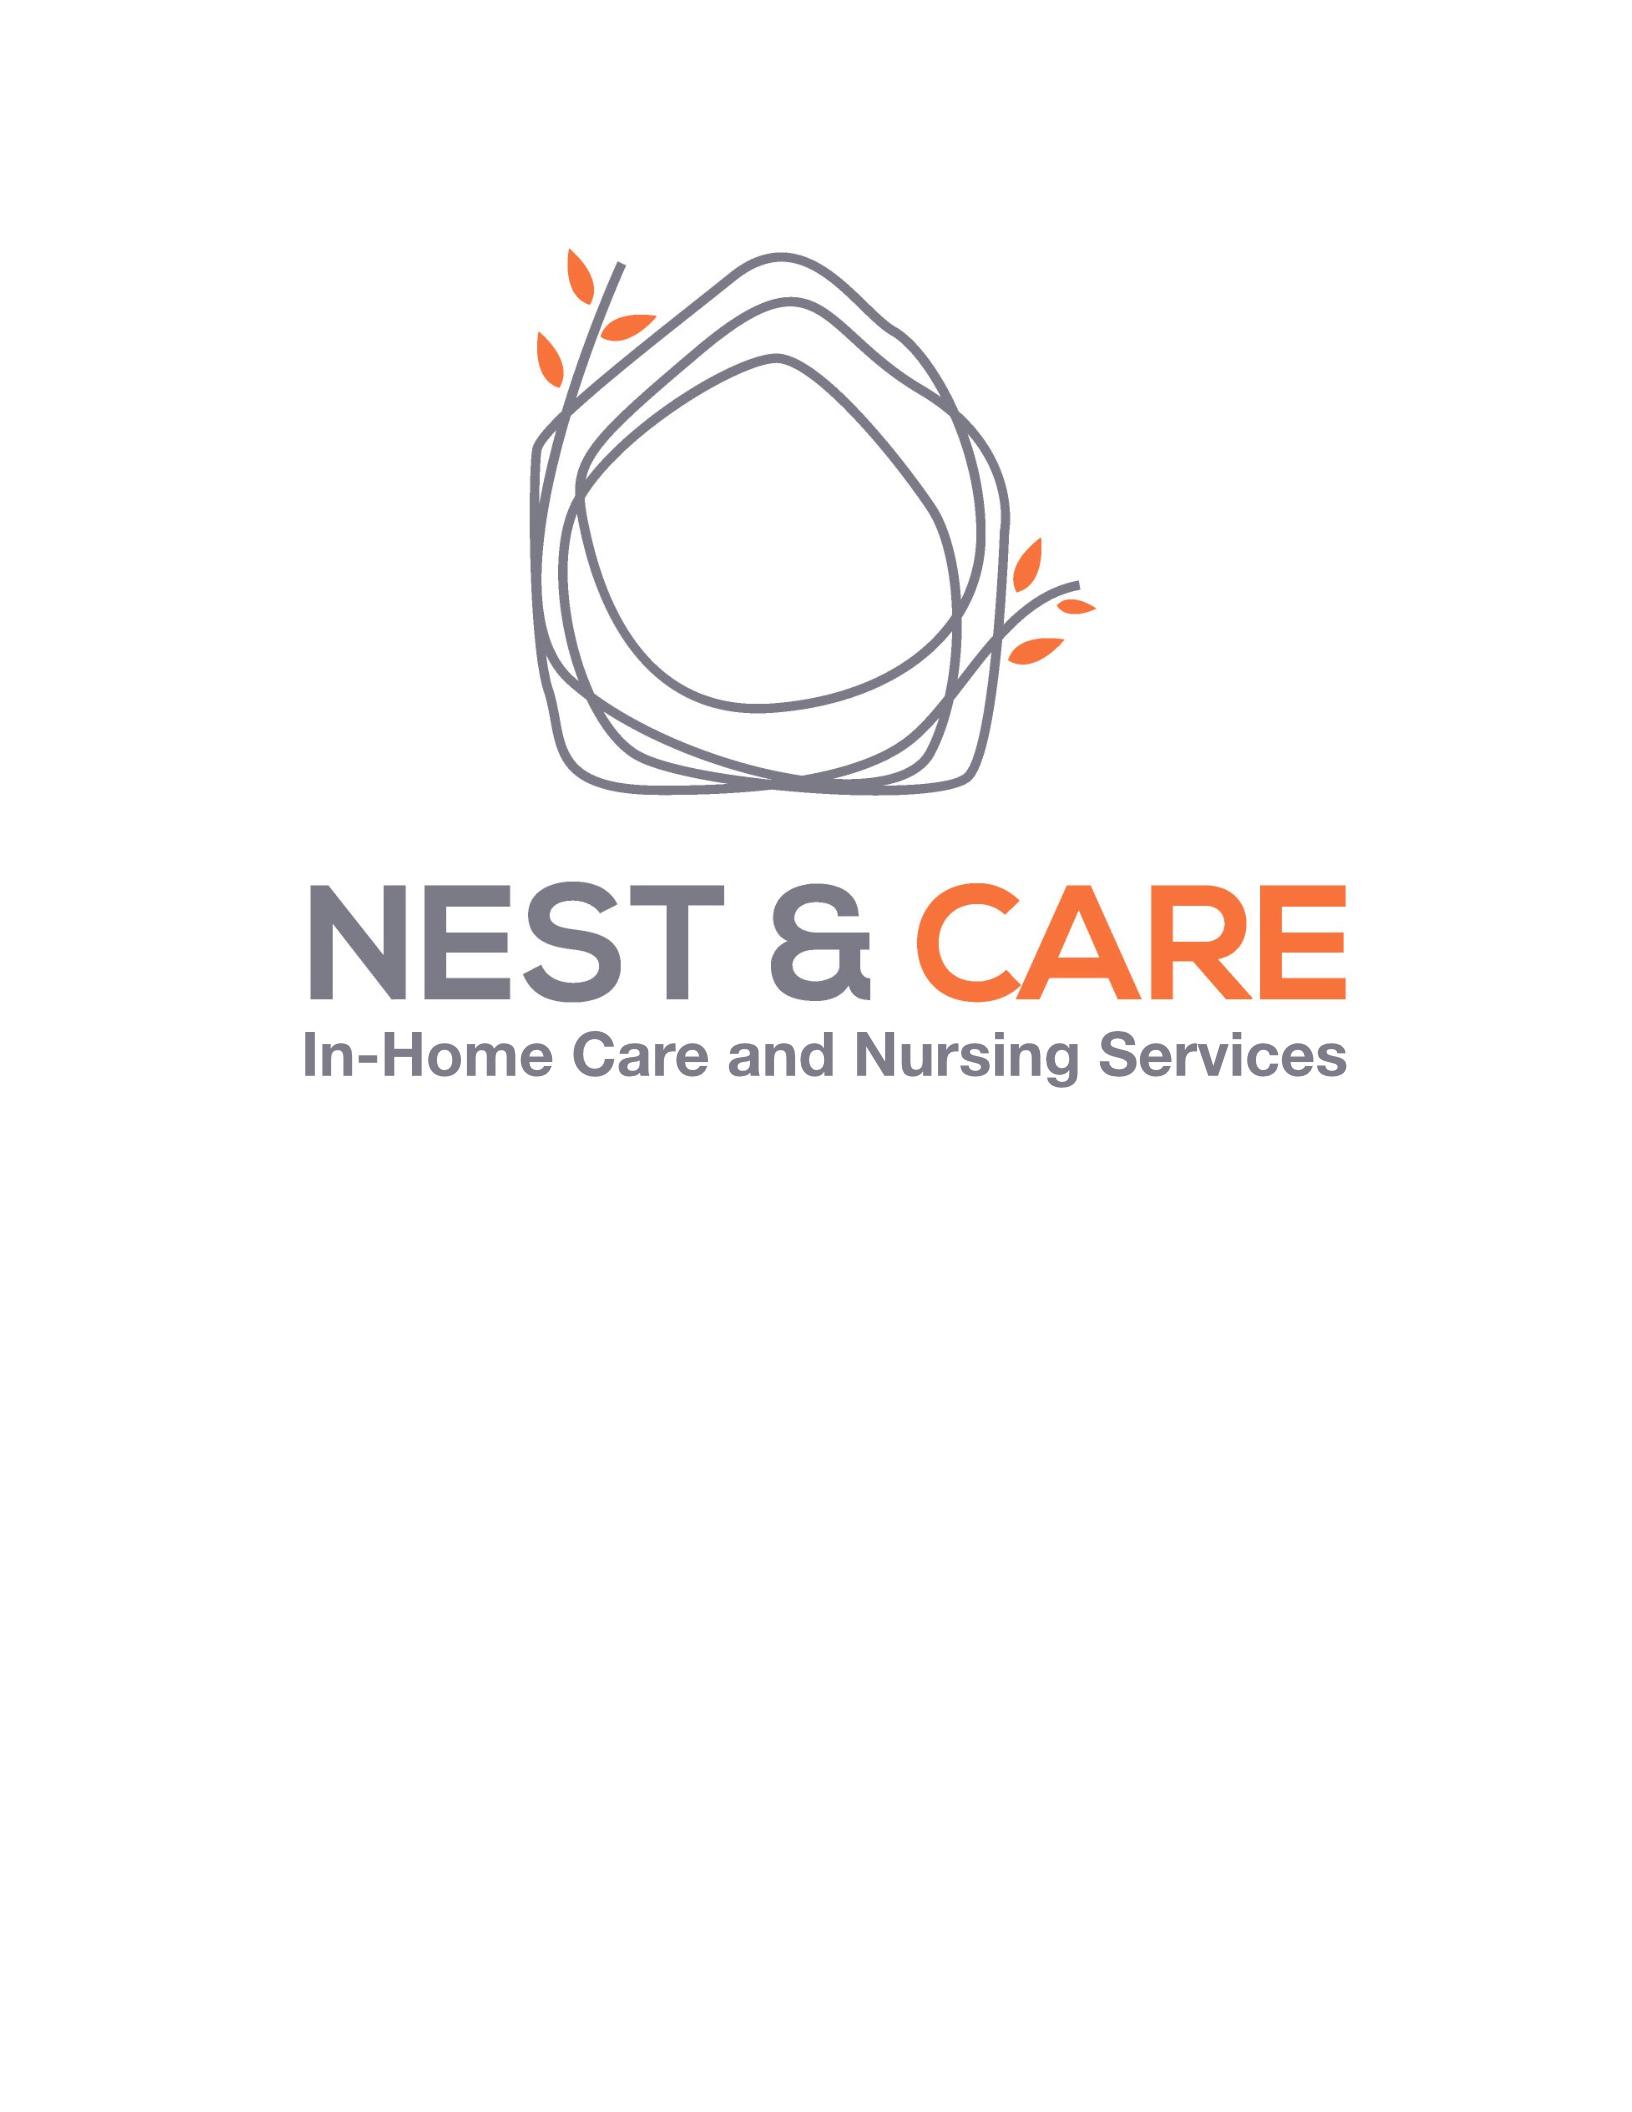 Nest & Care